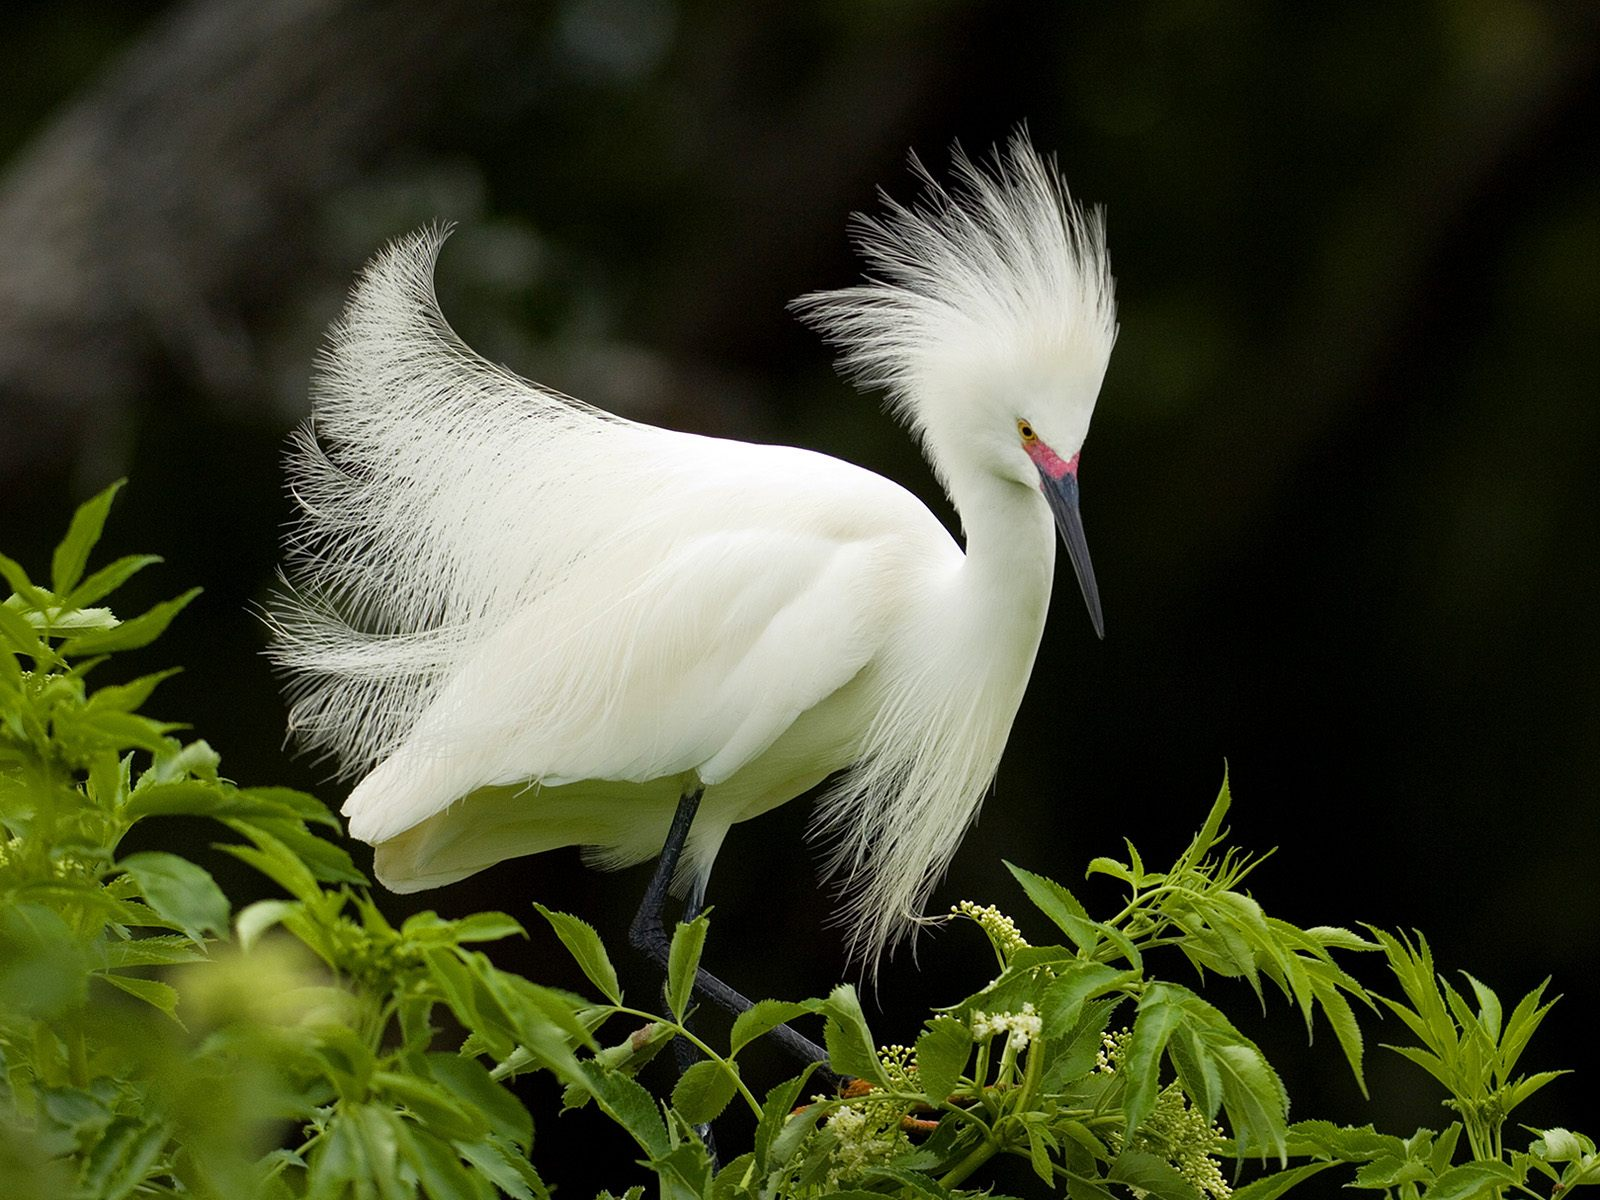 Wallpaper download online - Latest Birds Wallpapers Download Online Birds Wallpapers Online Birds Wallpaper